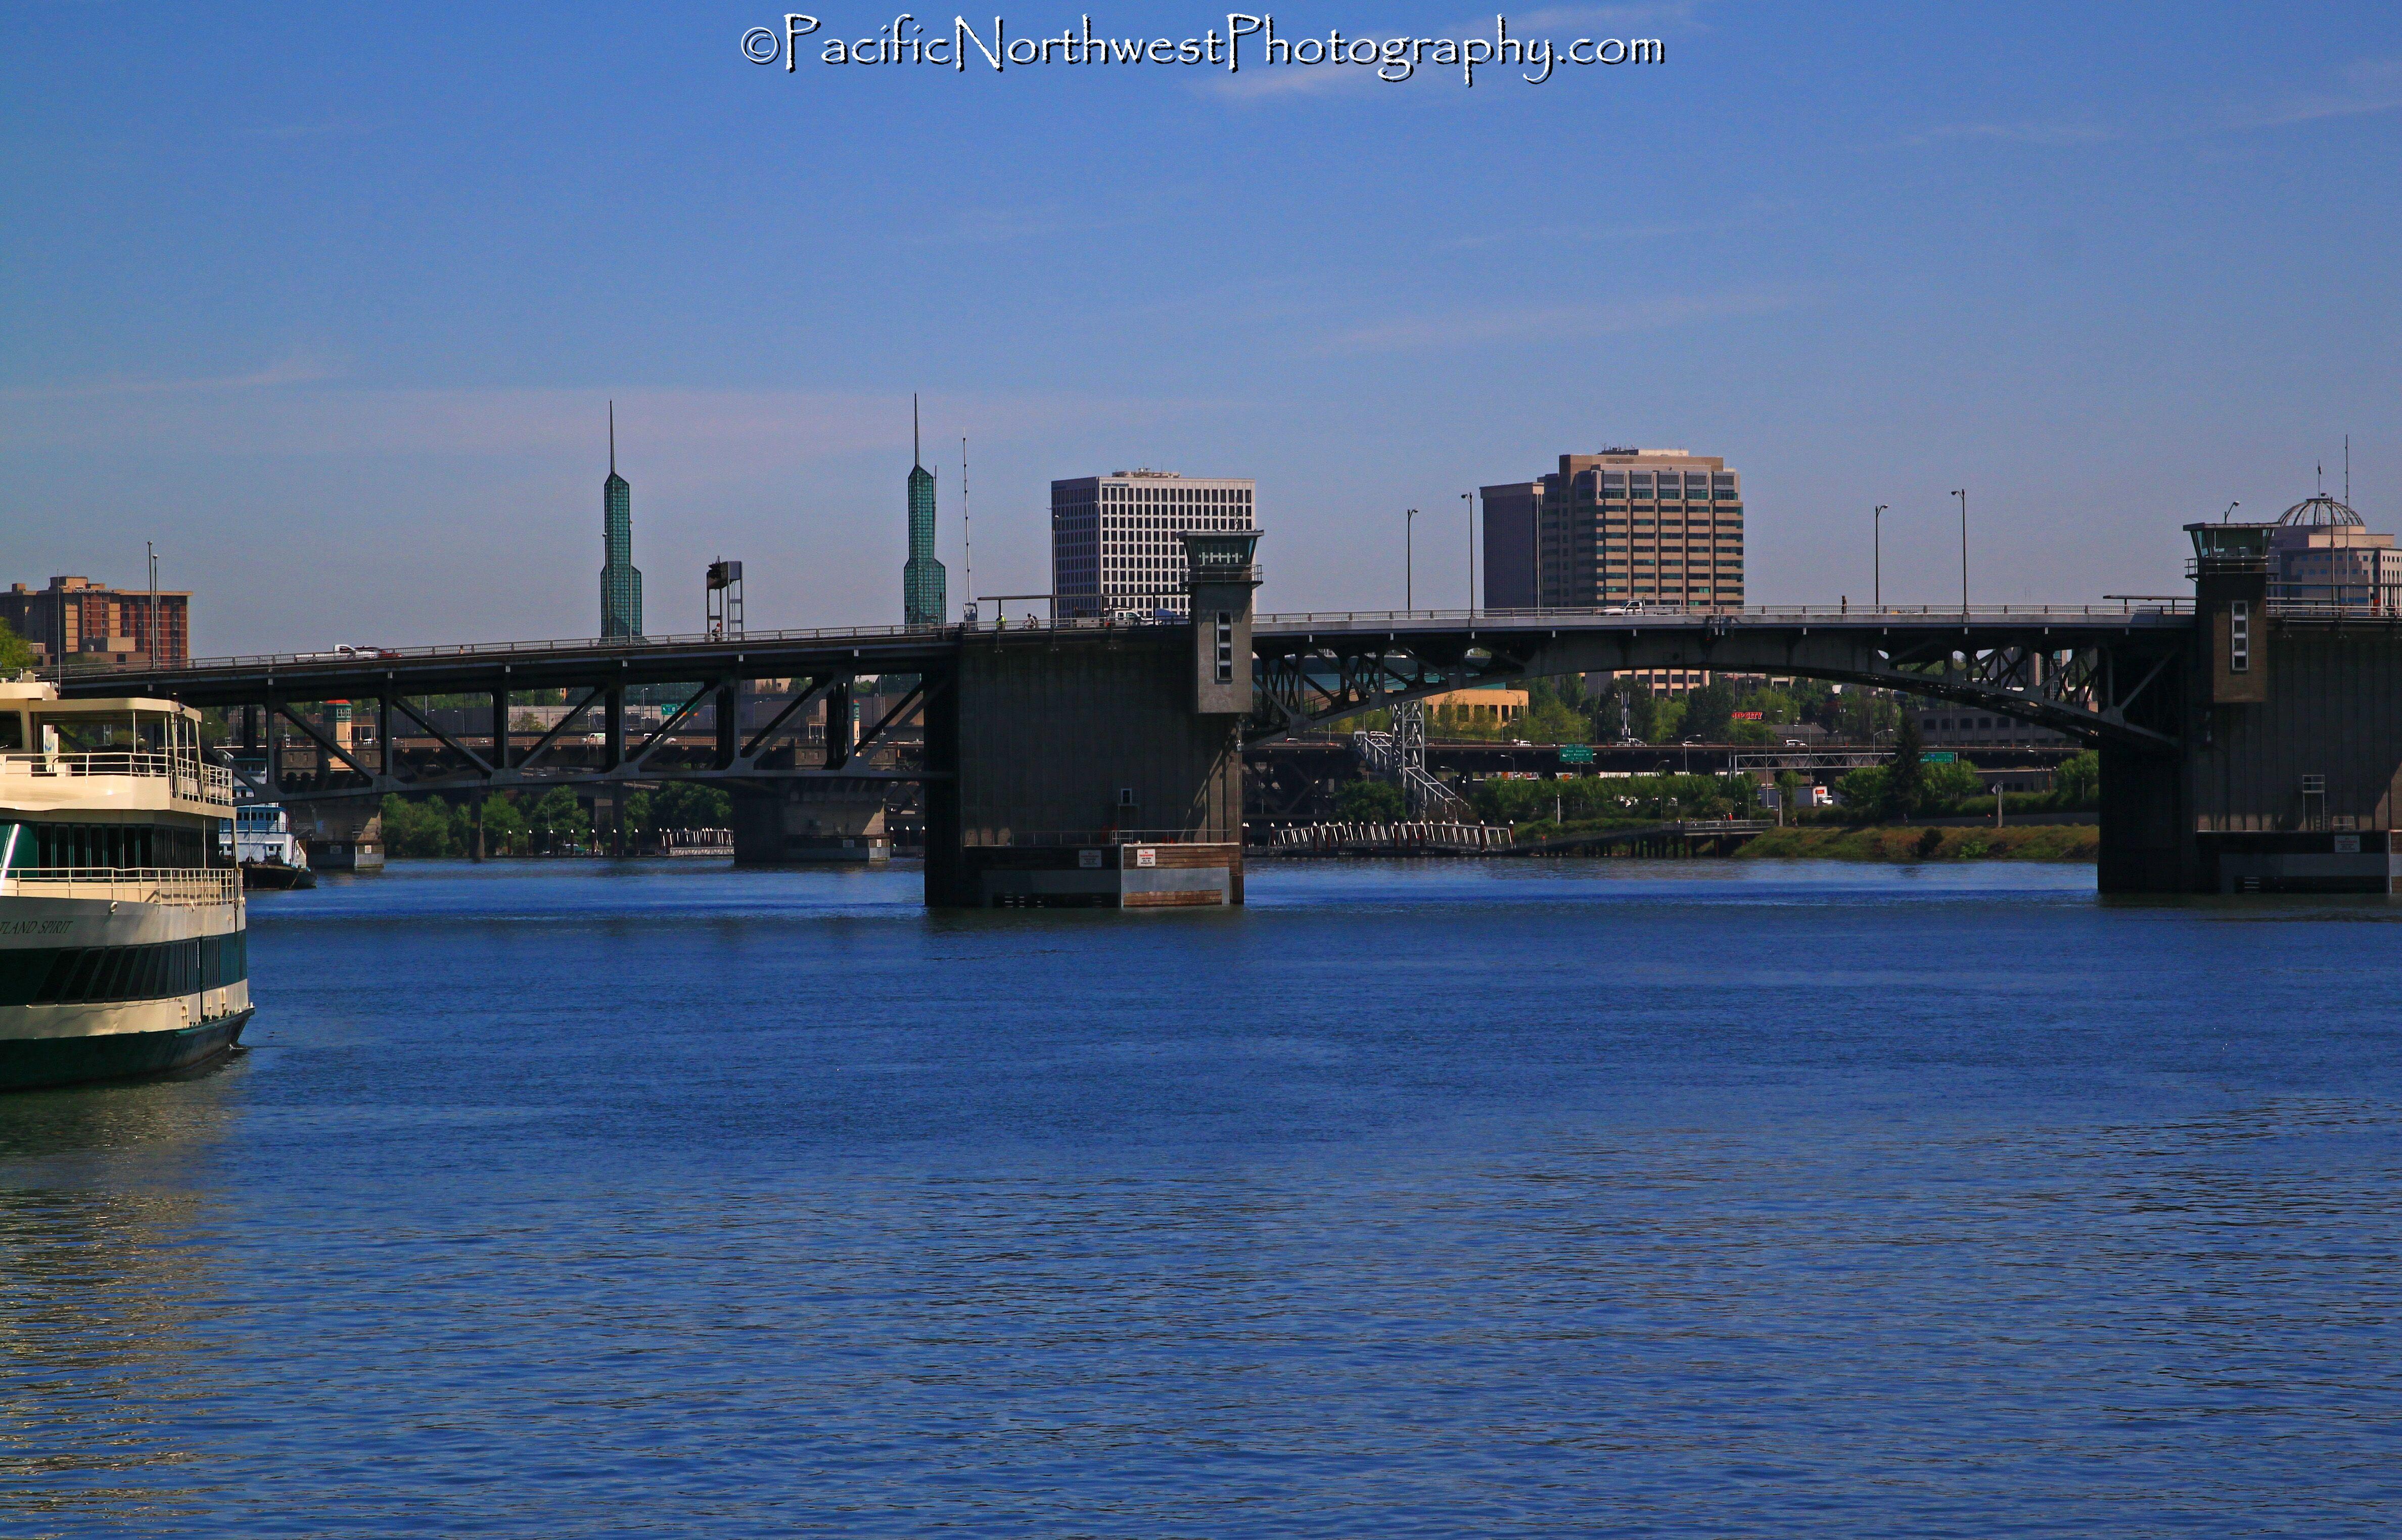 Historical Morrison Bridge